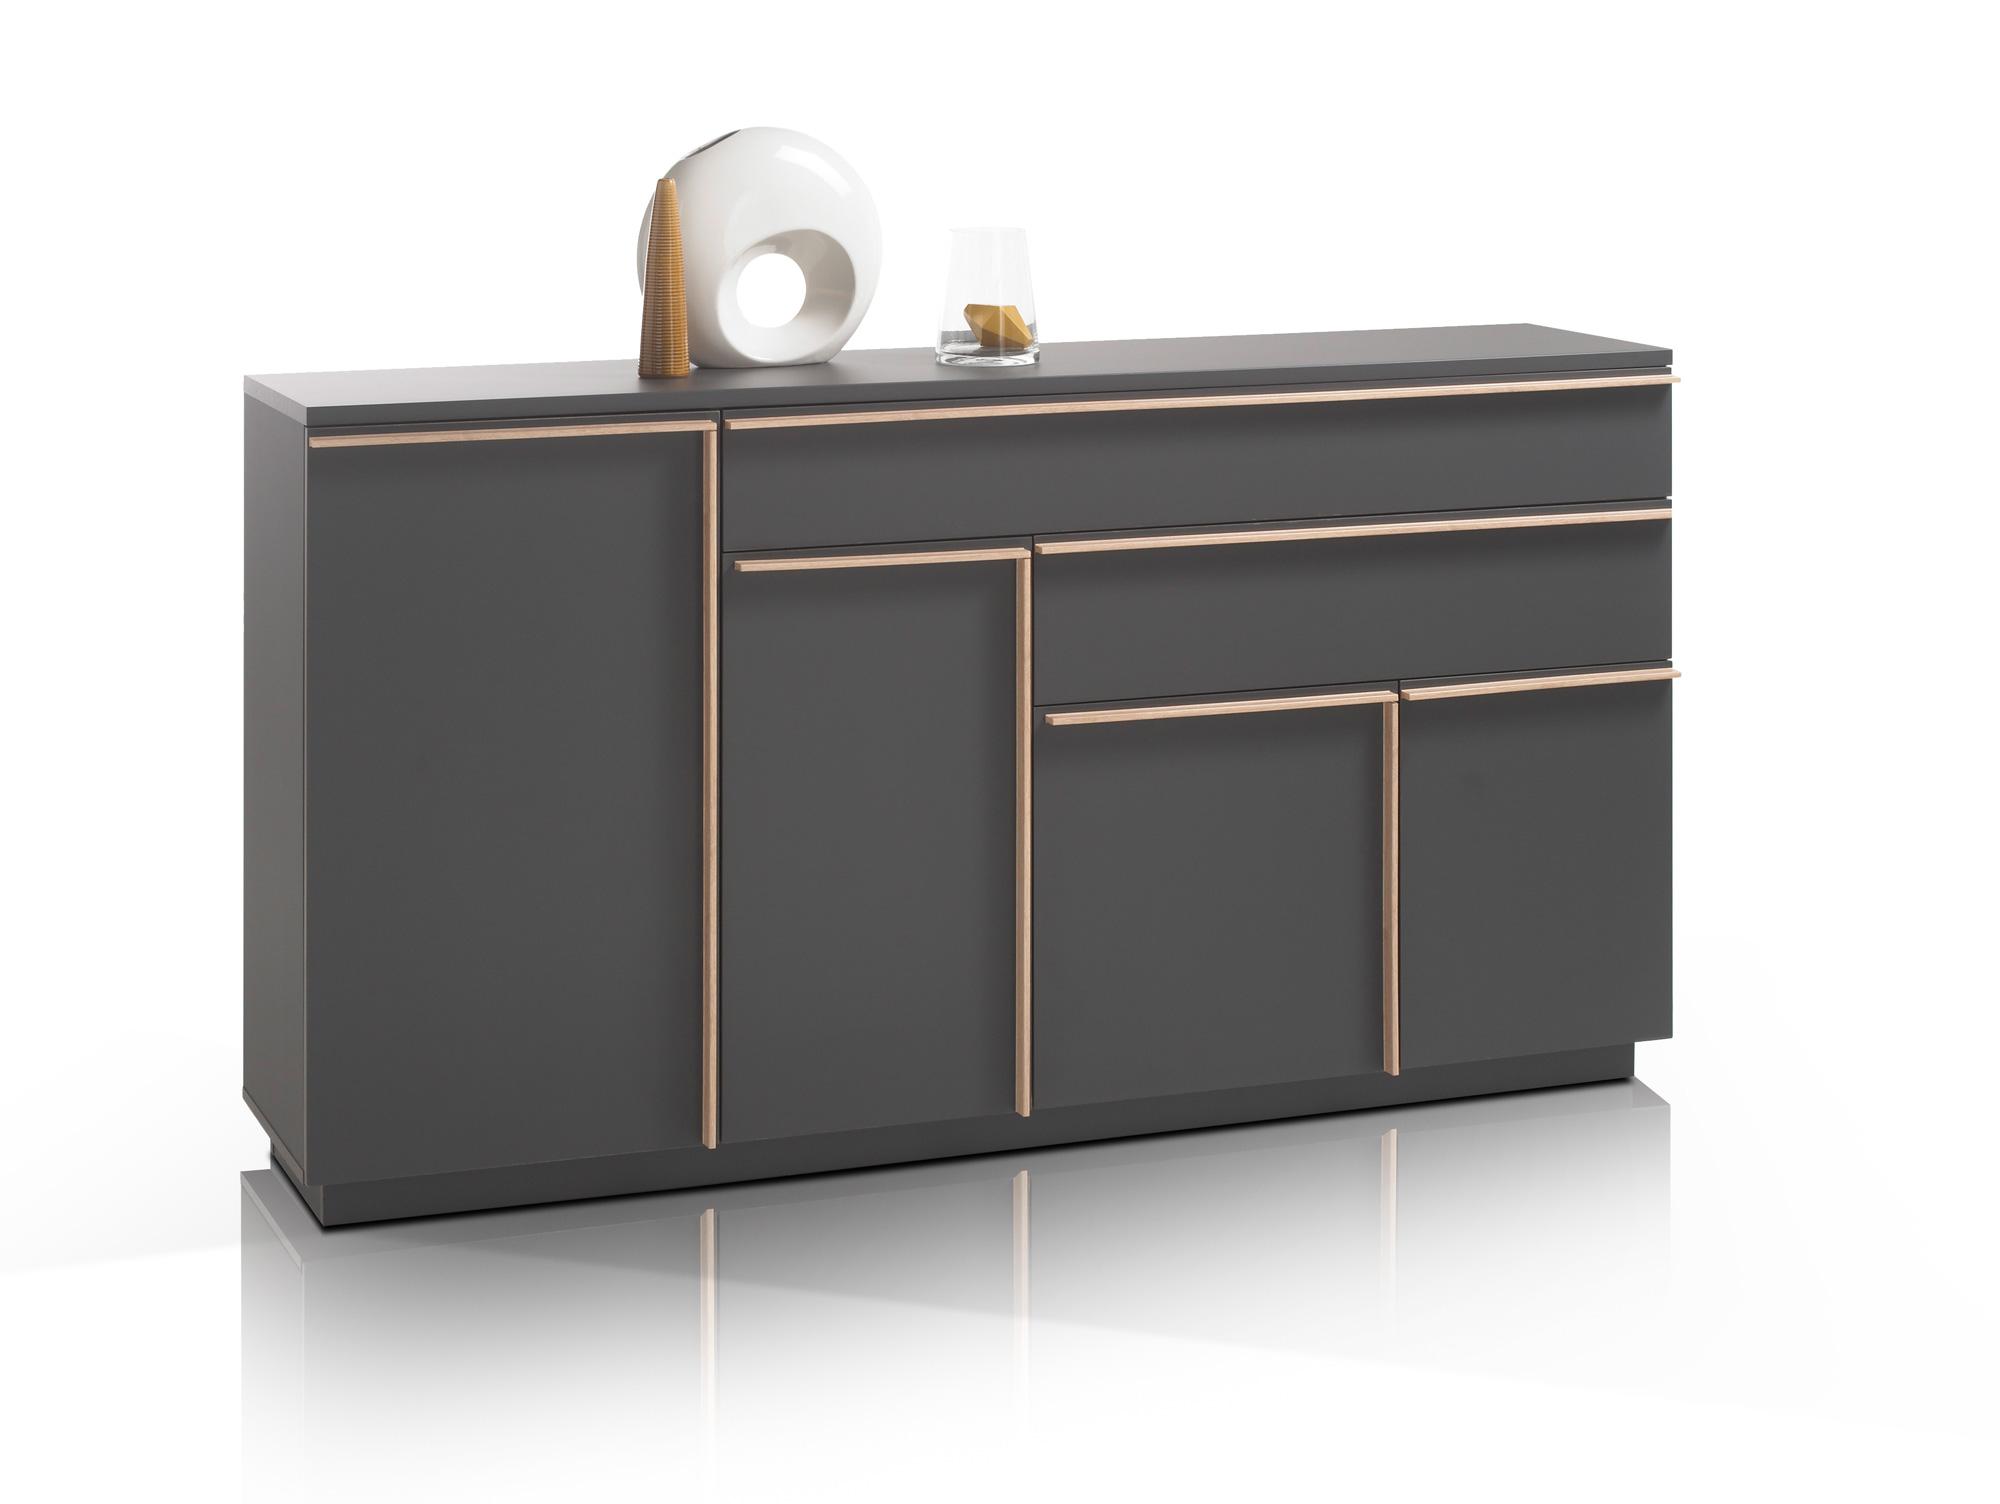 express m bel kommode schlafzimmerschrank graphit nachbildung bxhxt 140x80x42 cm art nr 30804. Black Bedroom Furniture Sets. Home Design Ideas